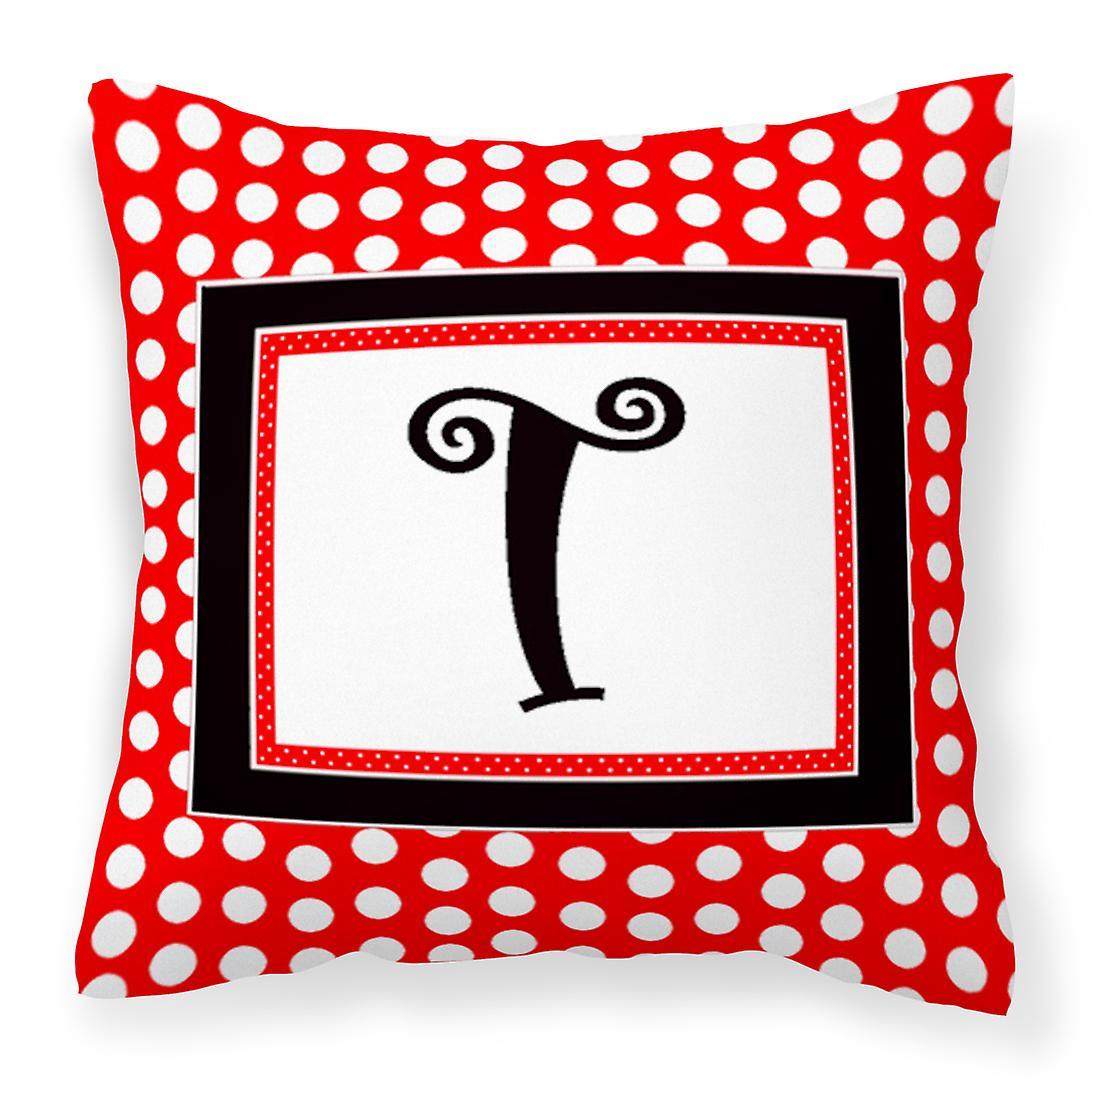 Initial Décoratifs Tissu Pois Noirs Rouge MonogrammeT Toile Oreiller dCBrxoe